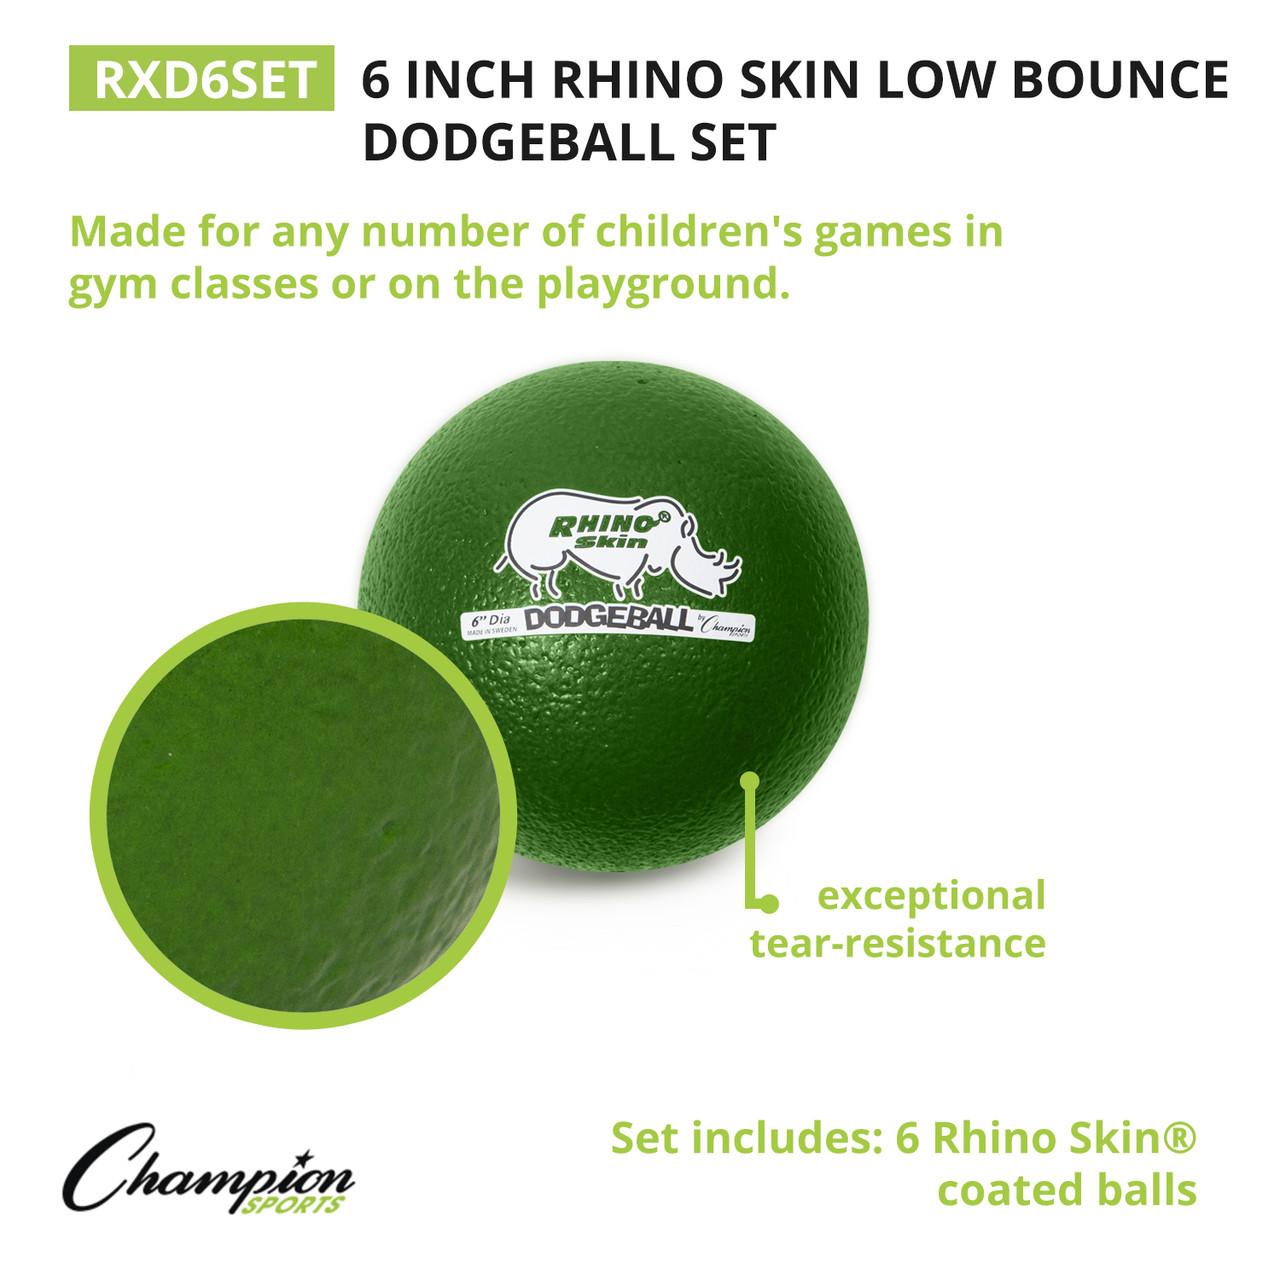 Rhino Skin DodgeRhino Skin Dodgeball Setball Set